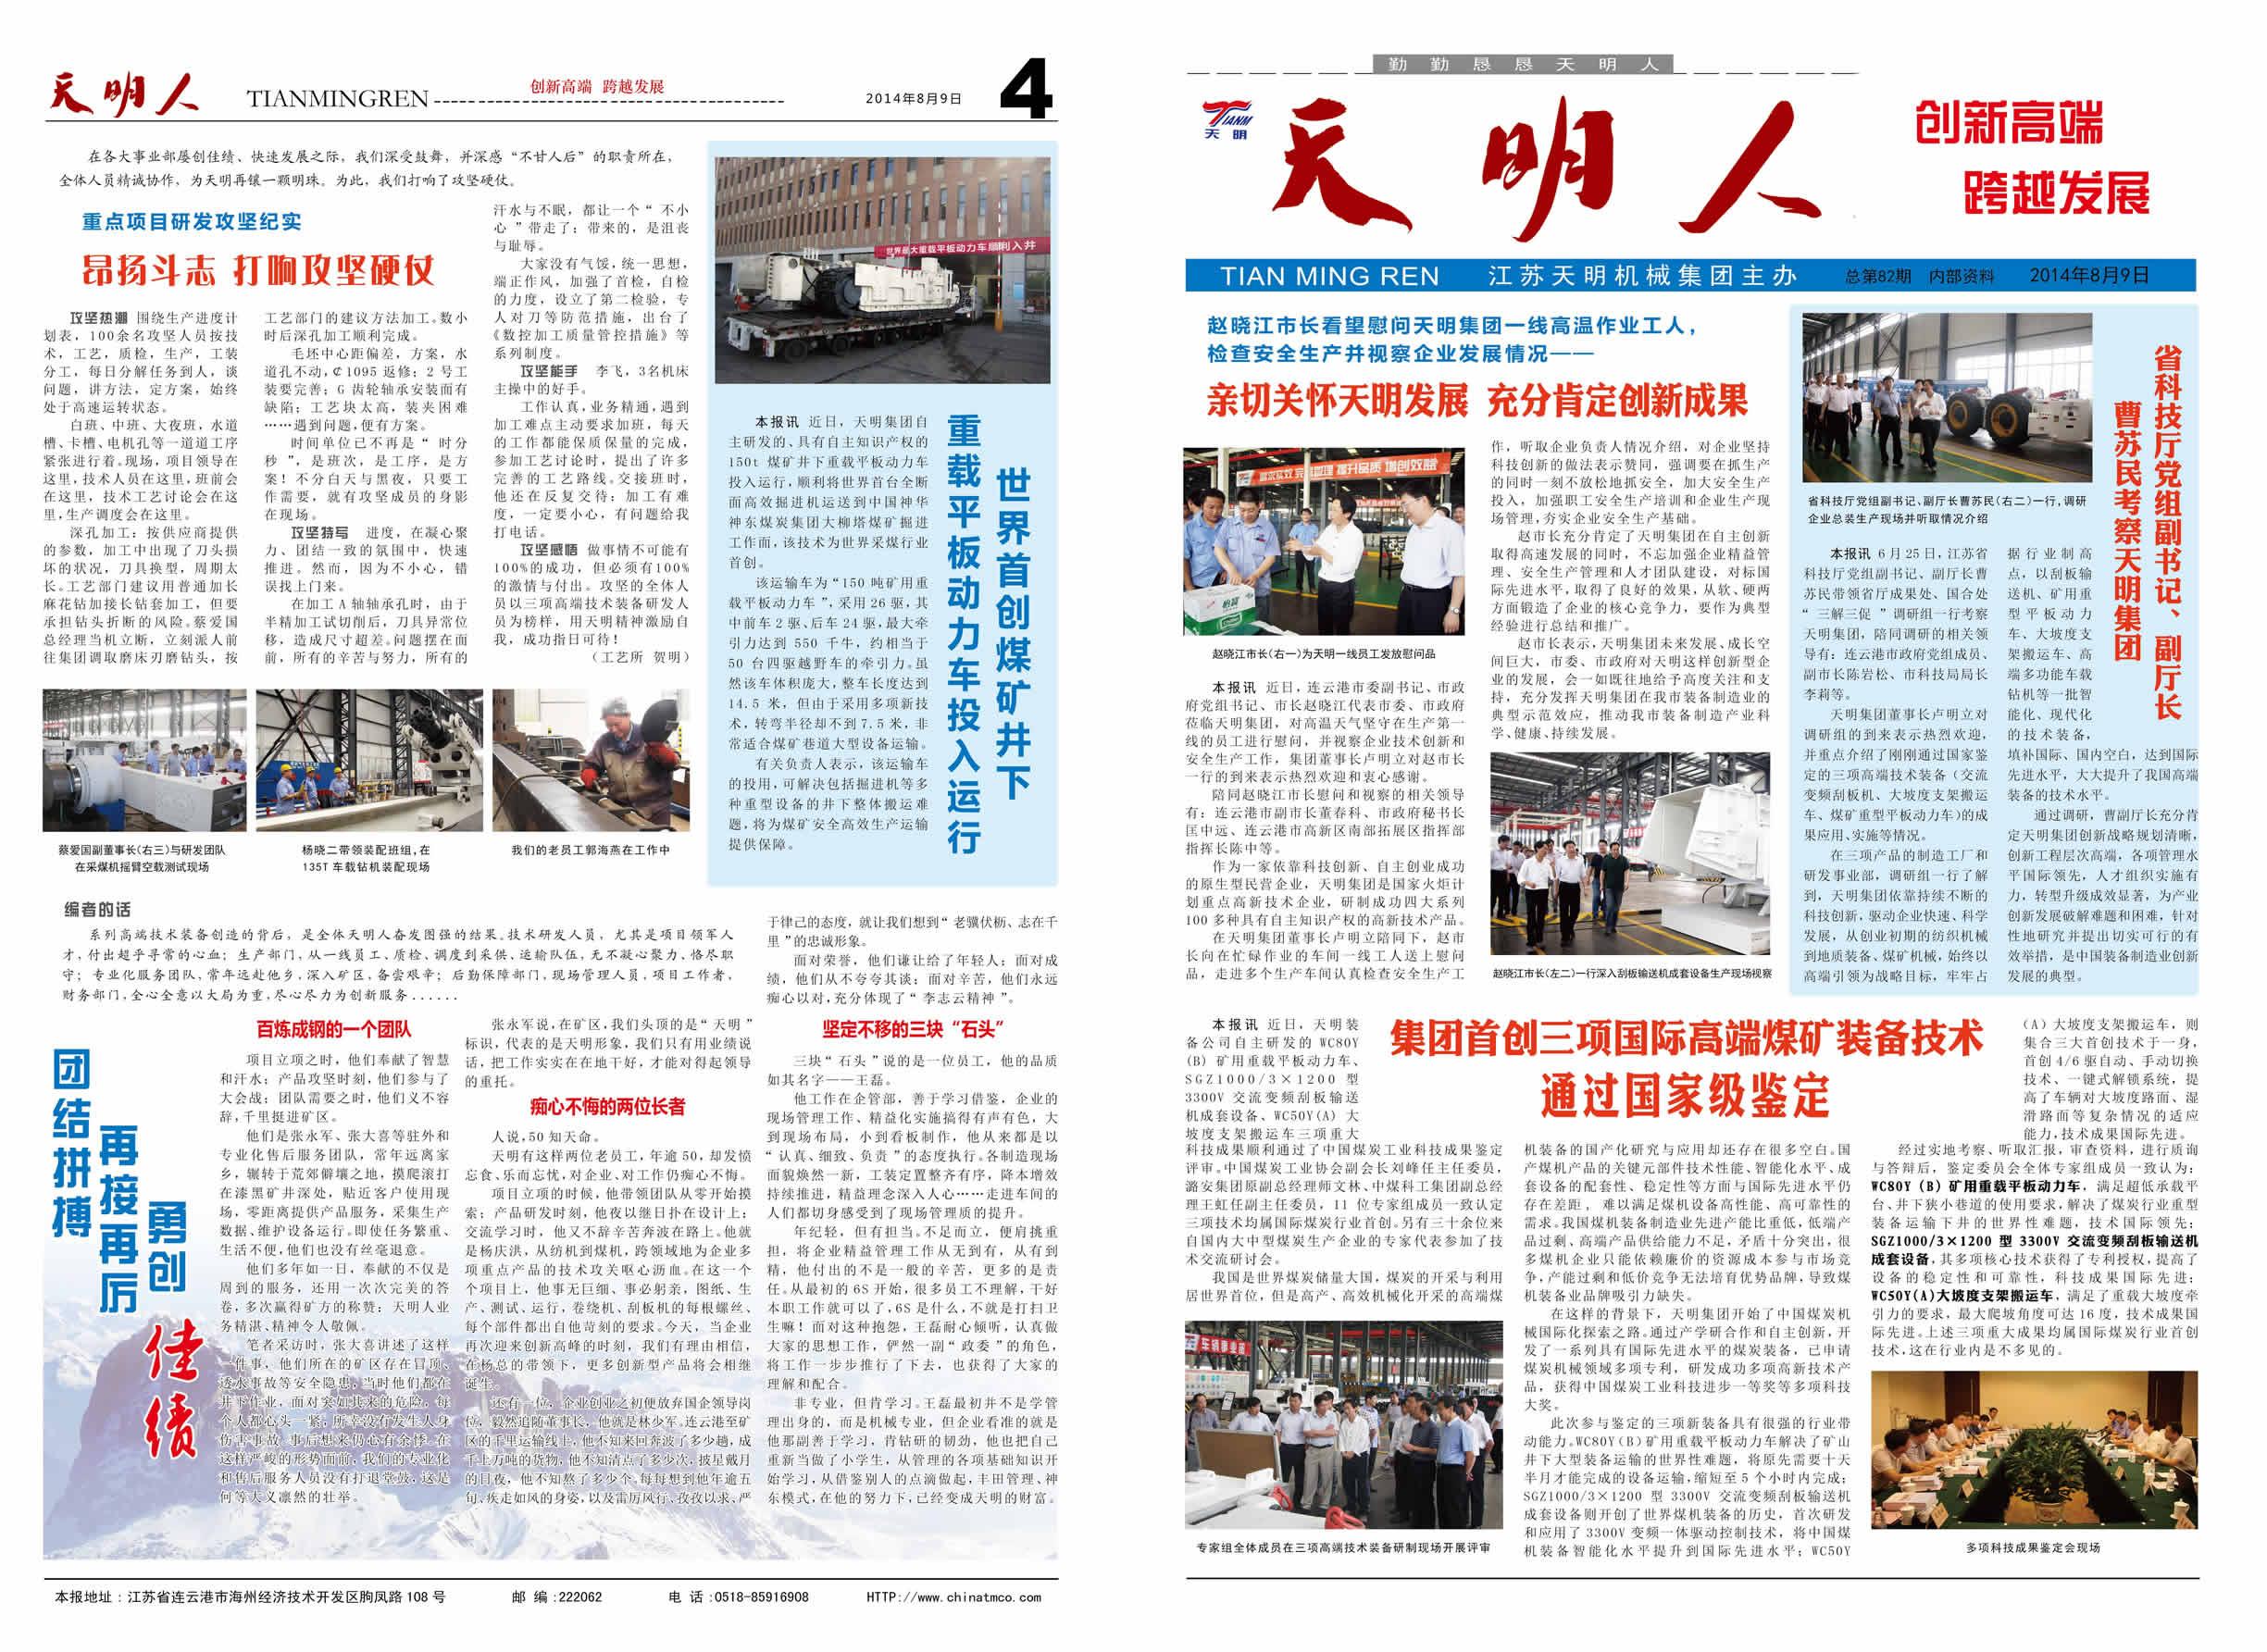 hg711皇冠国际_hg88皇冠国际平台_hg皇冠国际vip首页人2014第08期(总第82期)1、4版